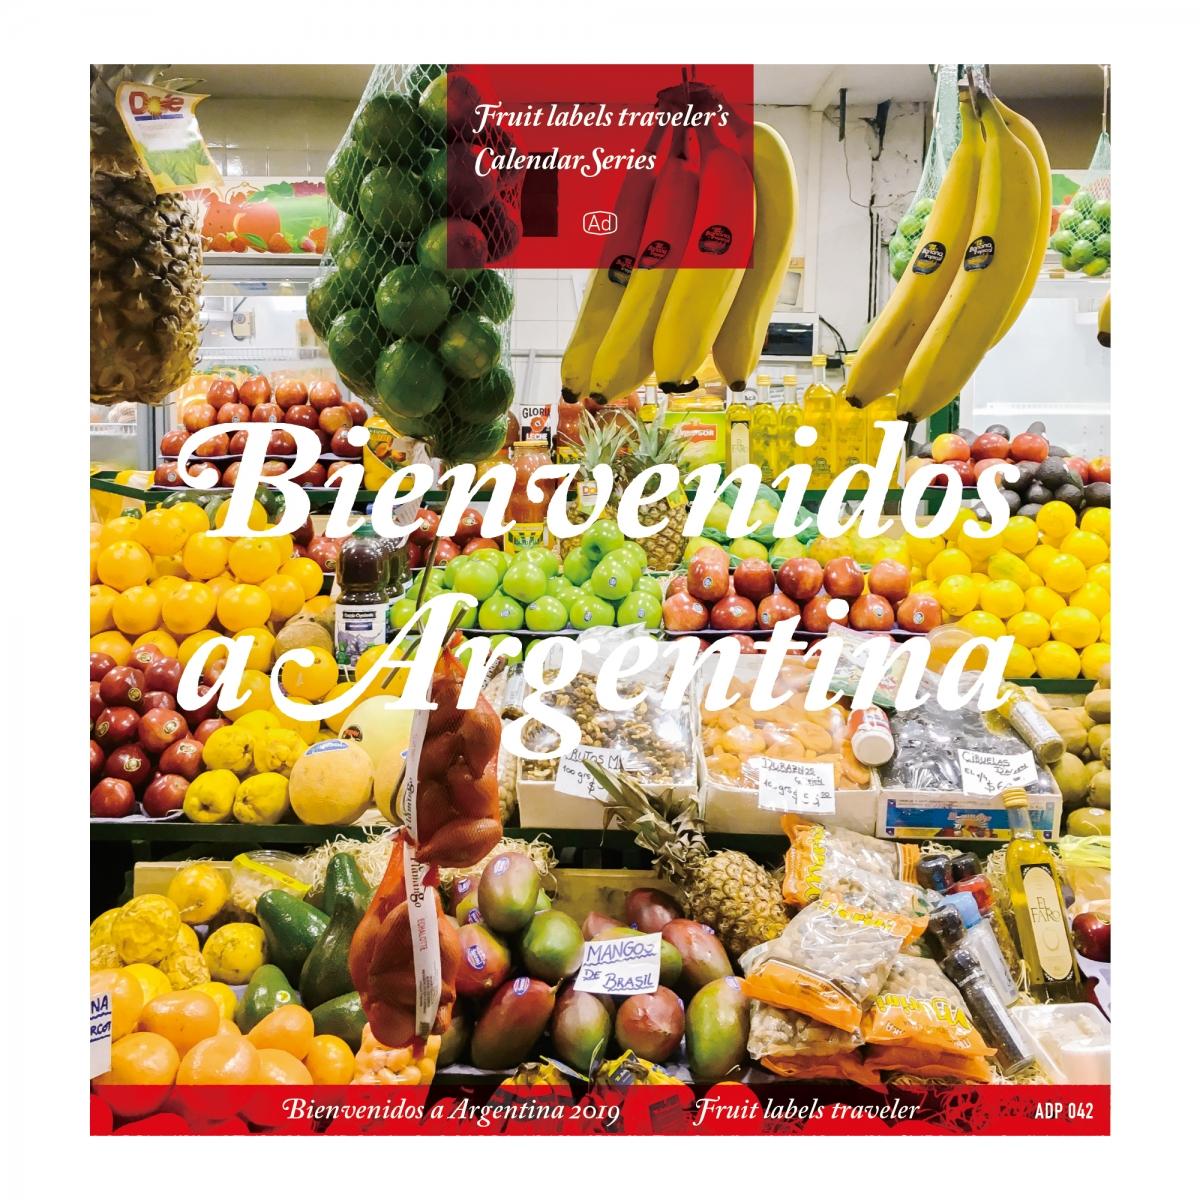 "Fruit labels traveler's Calendar Series ""Bienvenidos a Argentina"